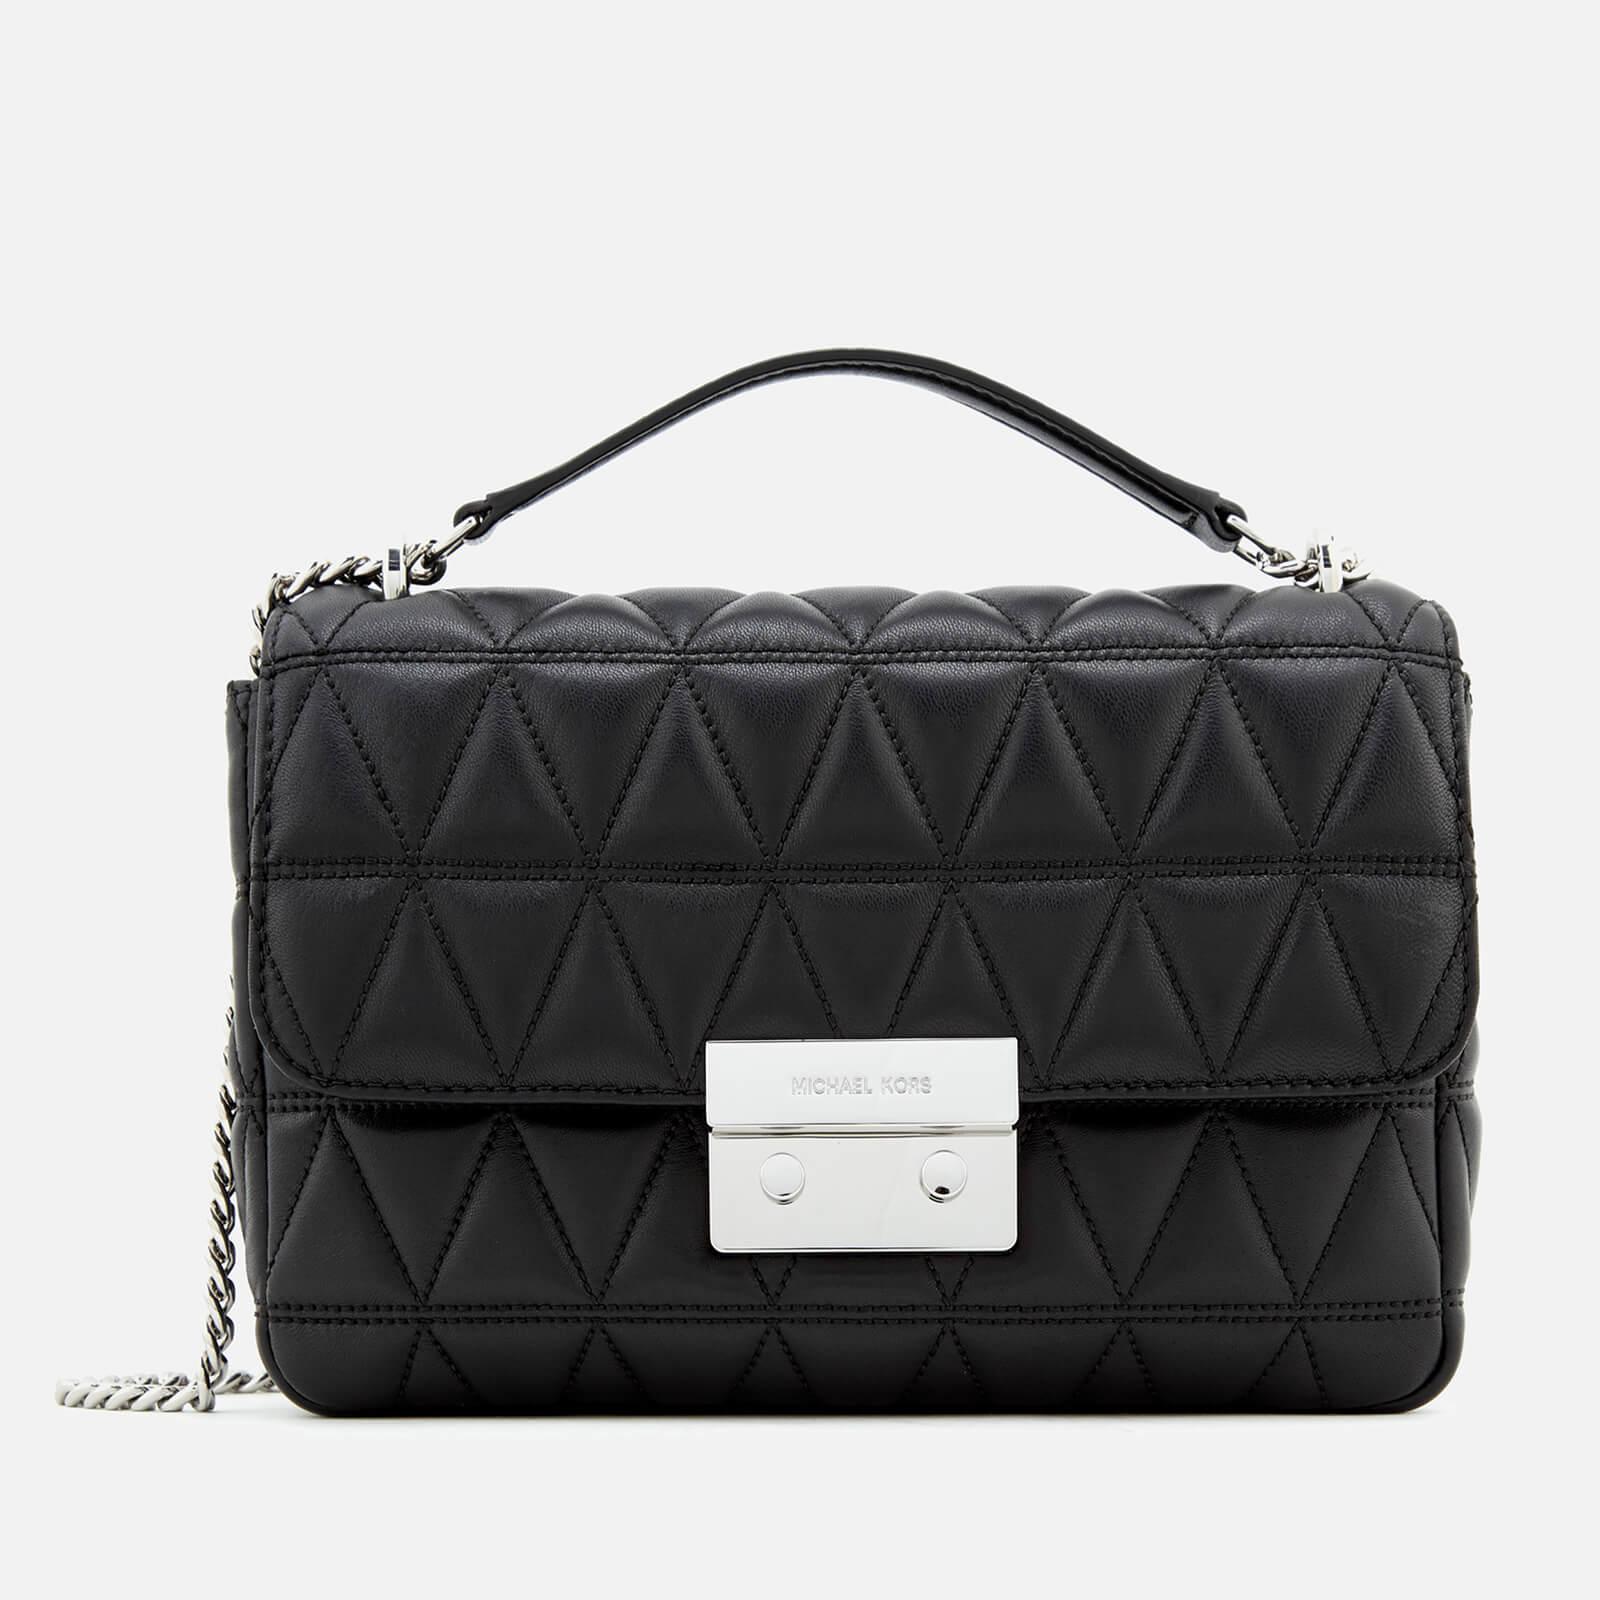 7c8080e5b5bf MICHAEL MICHAEL KORS Women's Sloan Large Chain Shoulder Bag - Black - Free  UK Delivery over £50